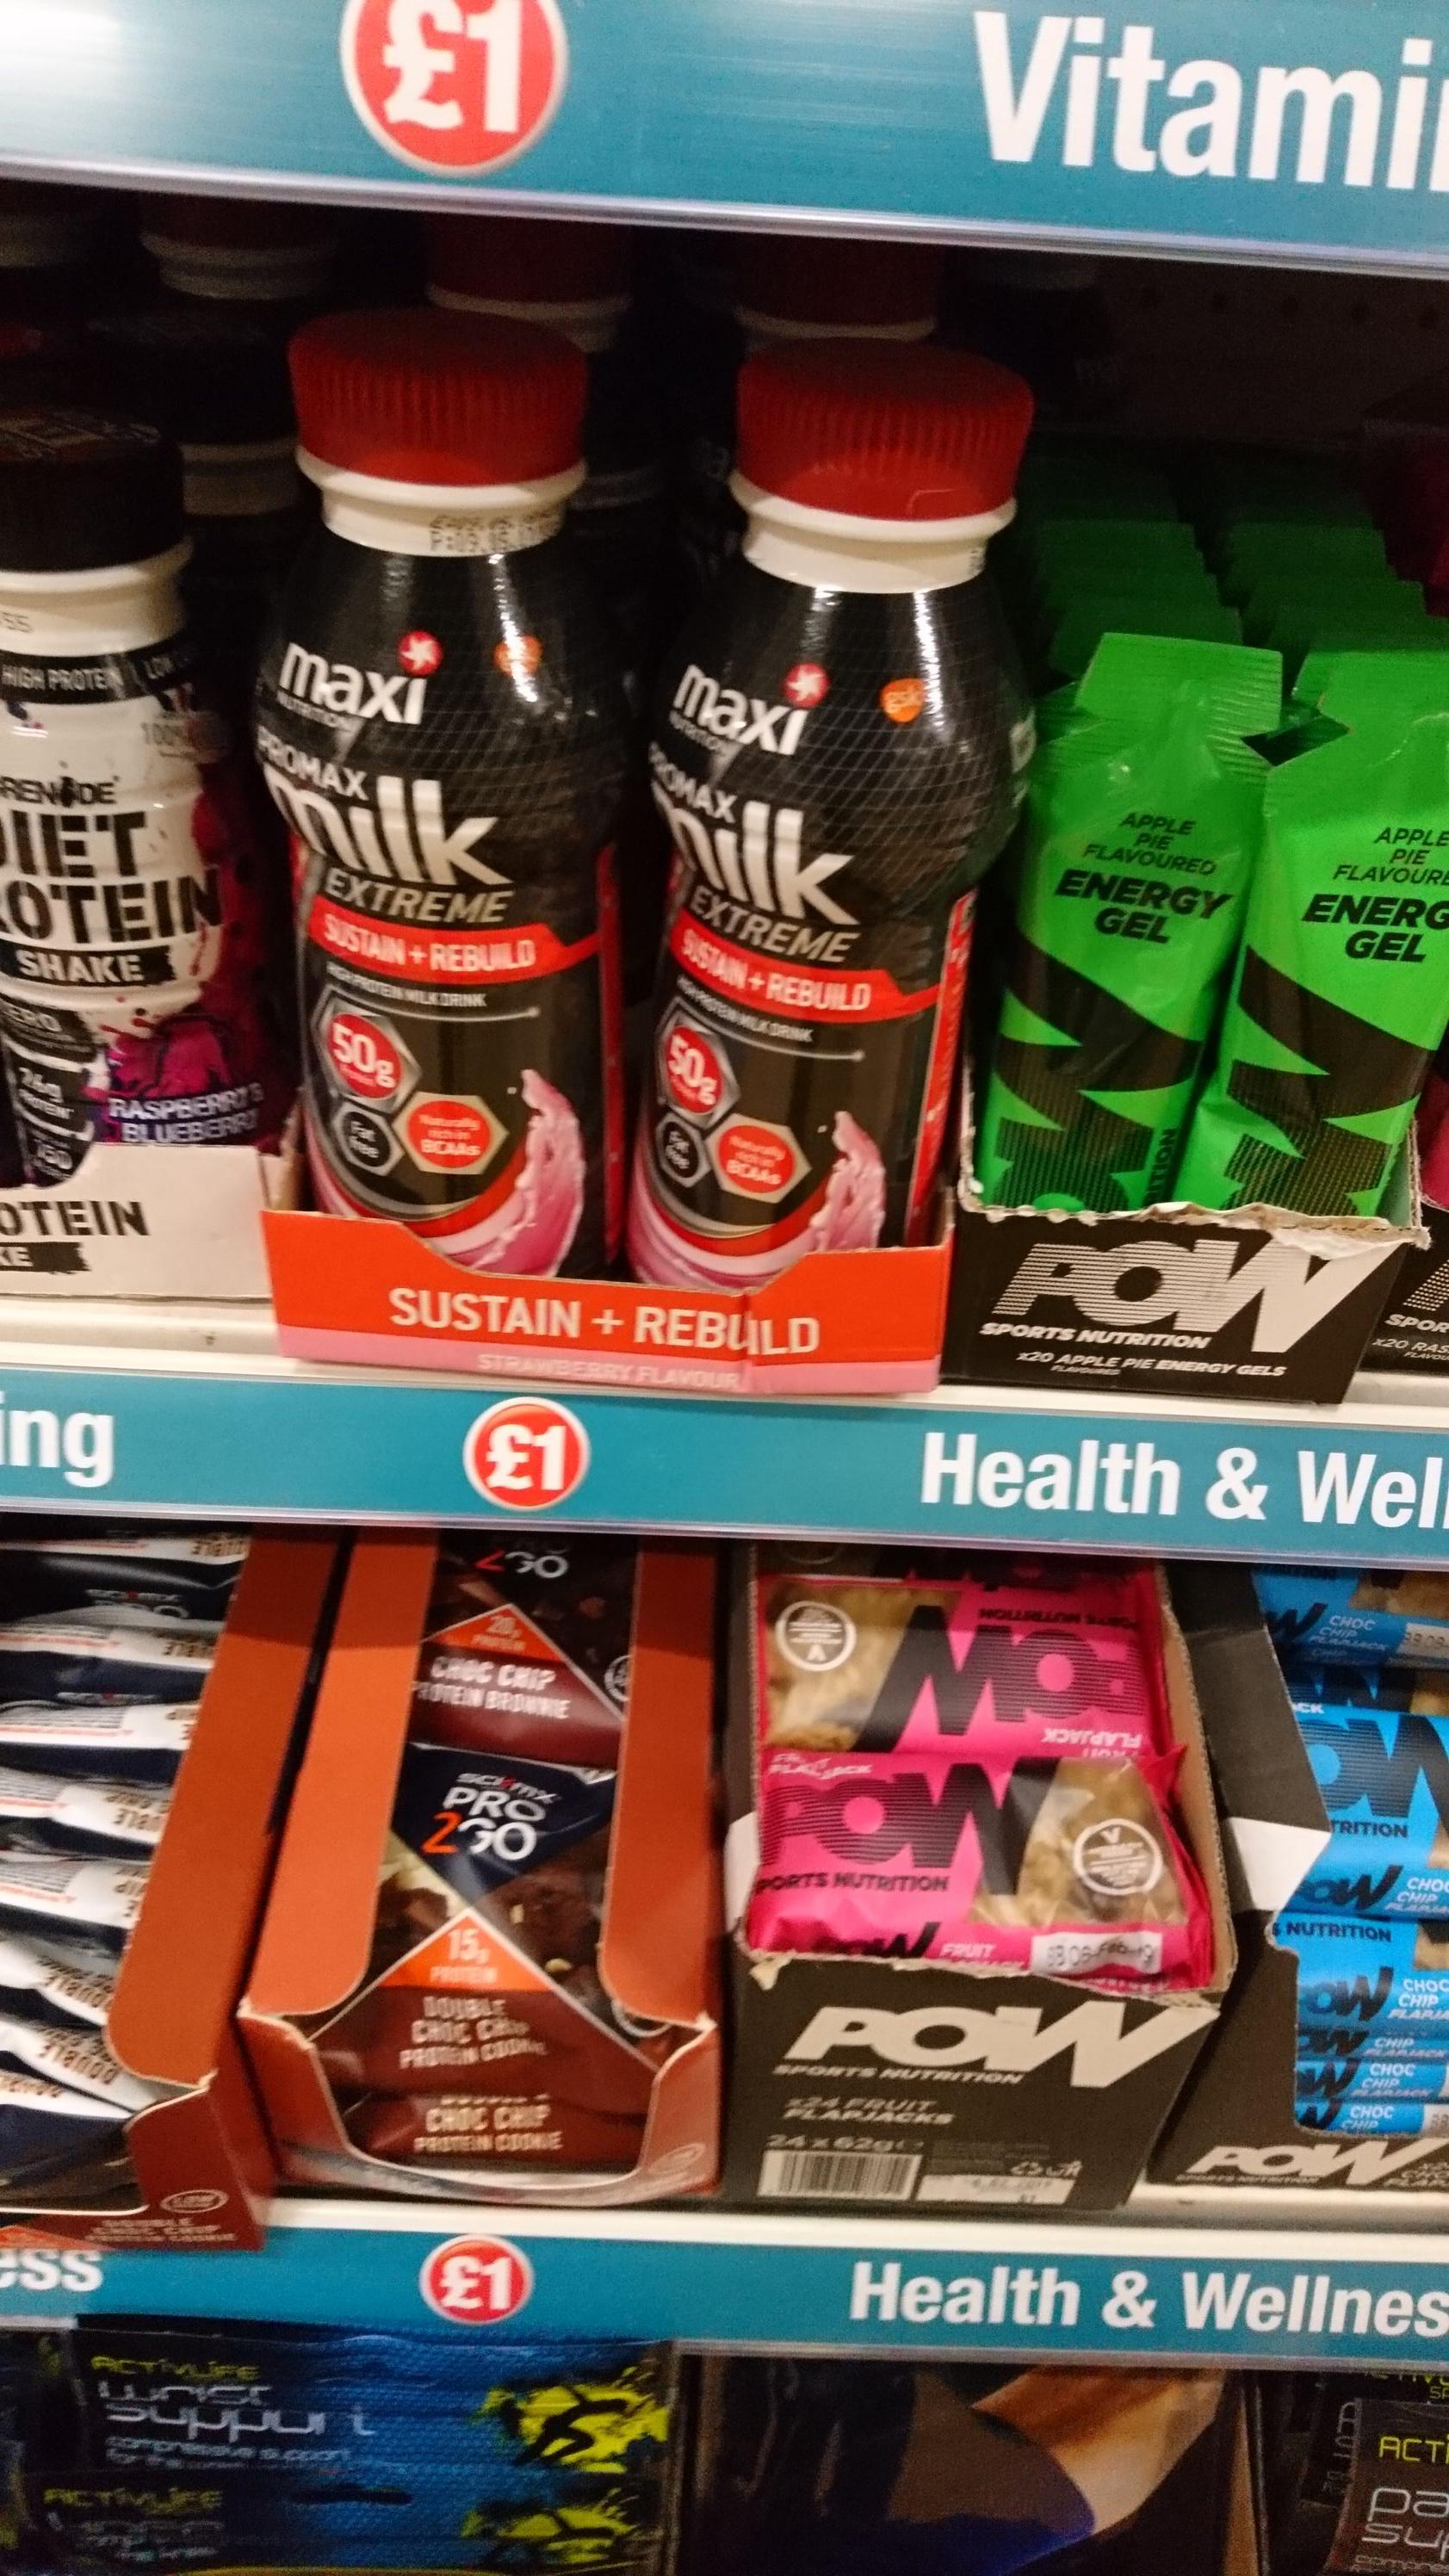 Maxi nutrition strawberry 50g of protein shake @ poundland